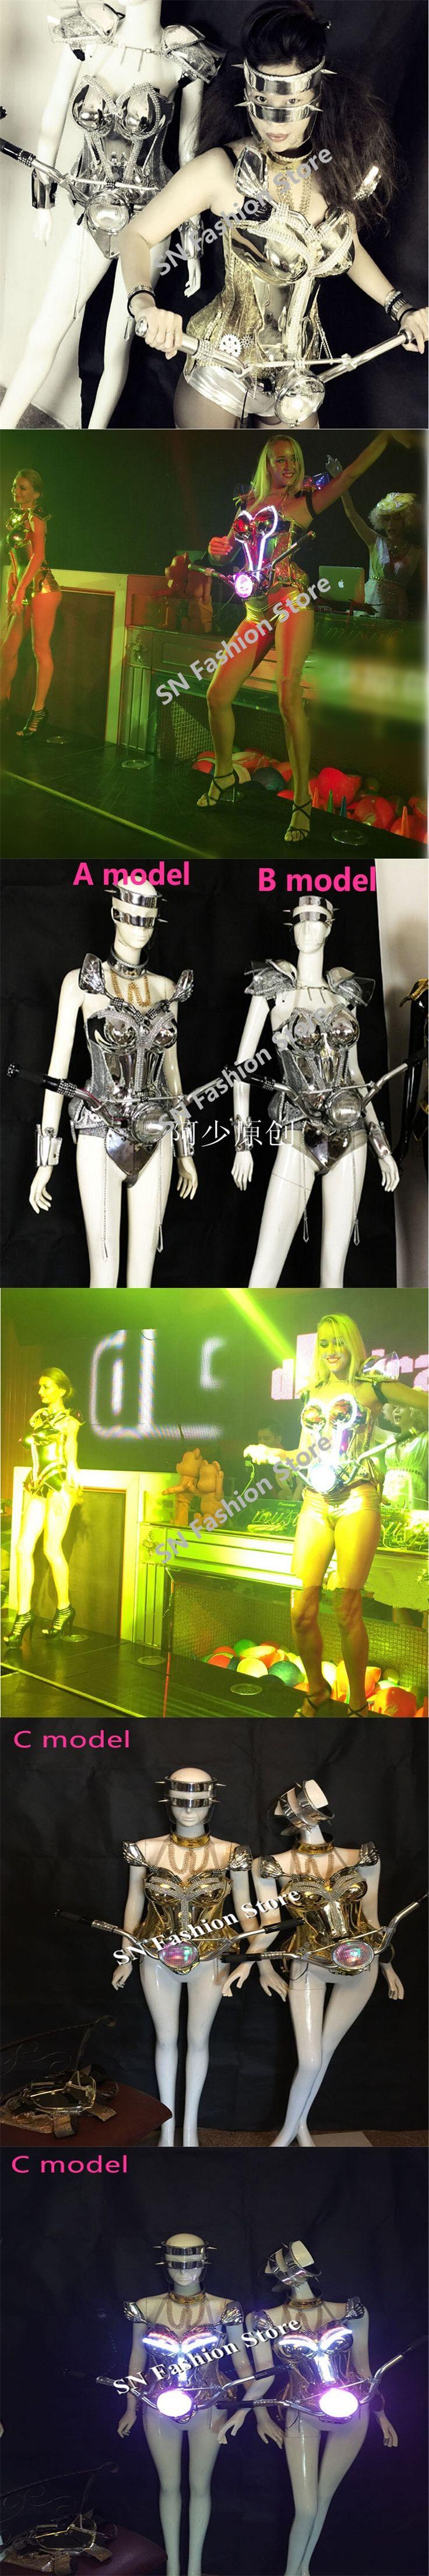 WX16 Bar Singer led light dance costumes led light dj disco ballroom clothes dress Nightclubs Catwalk stage cosplay show wears